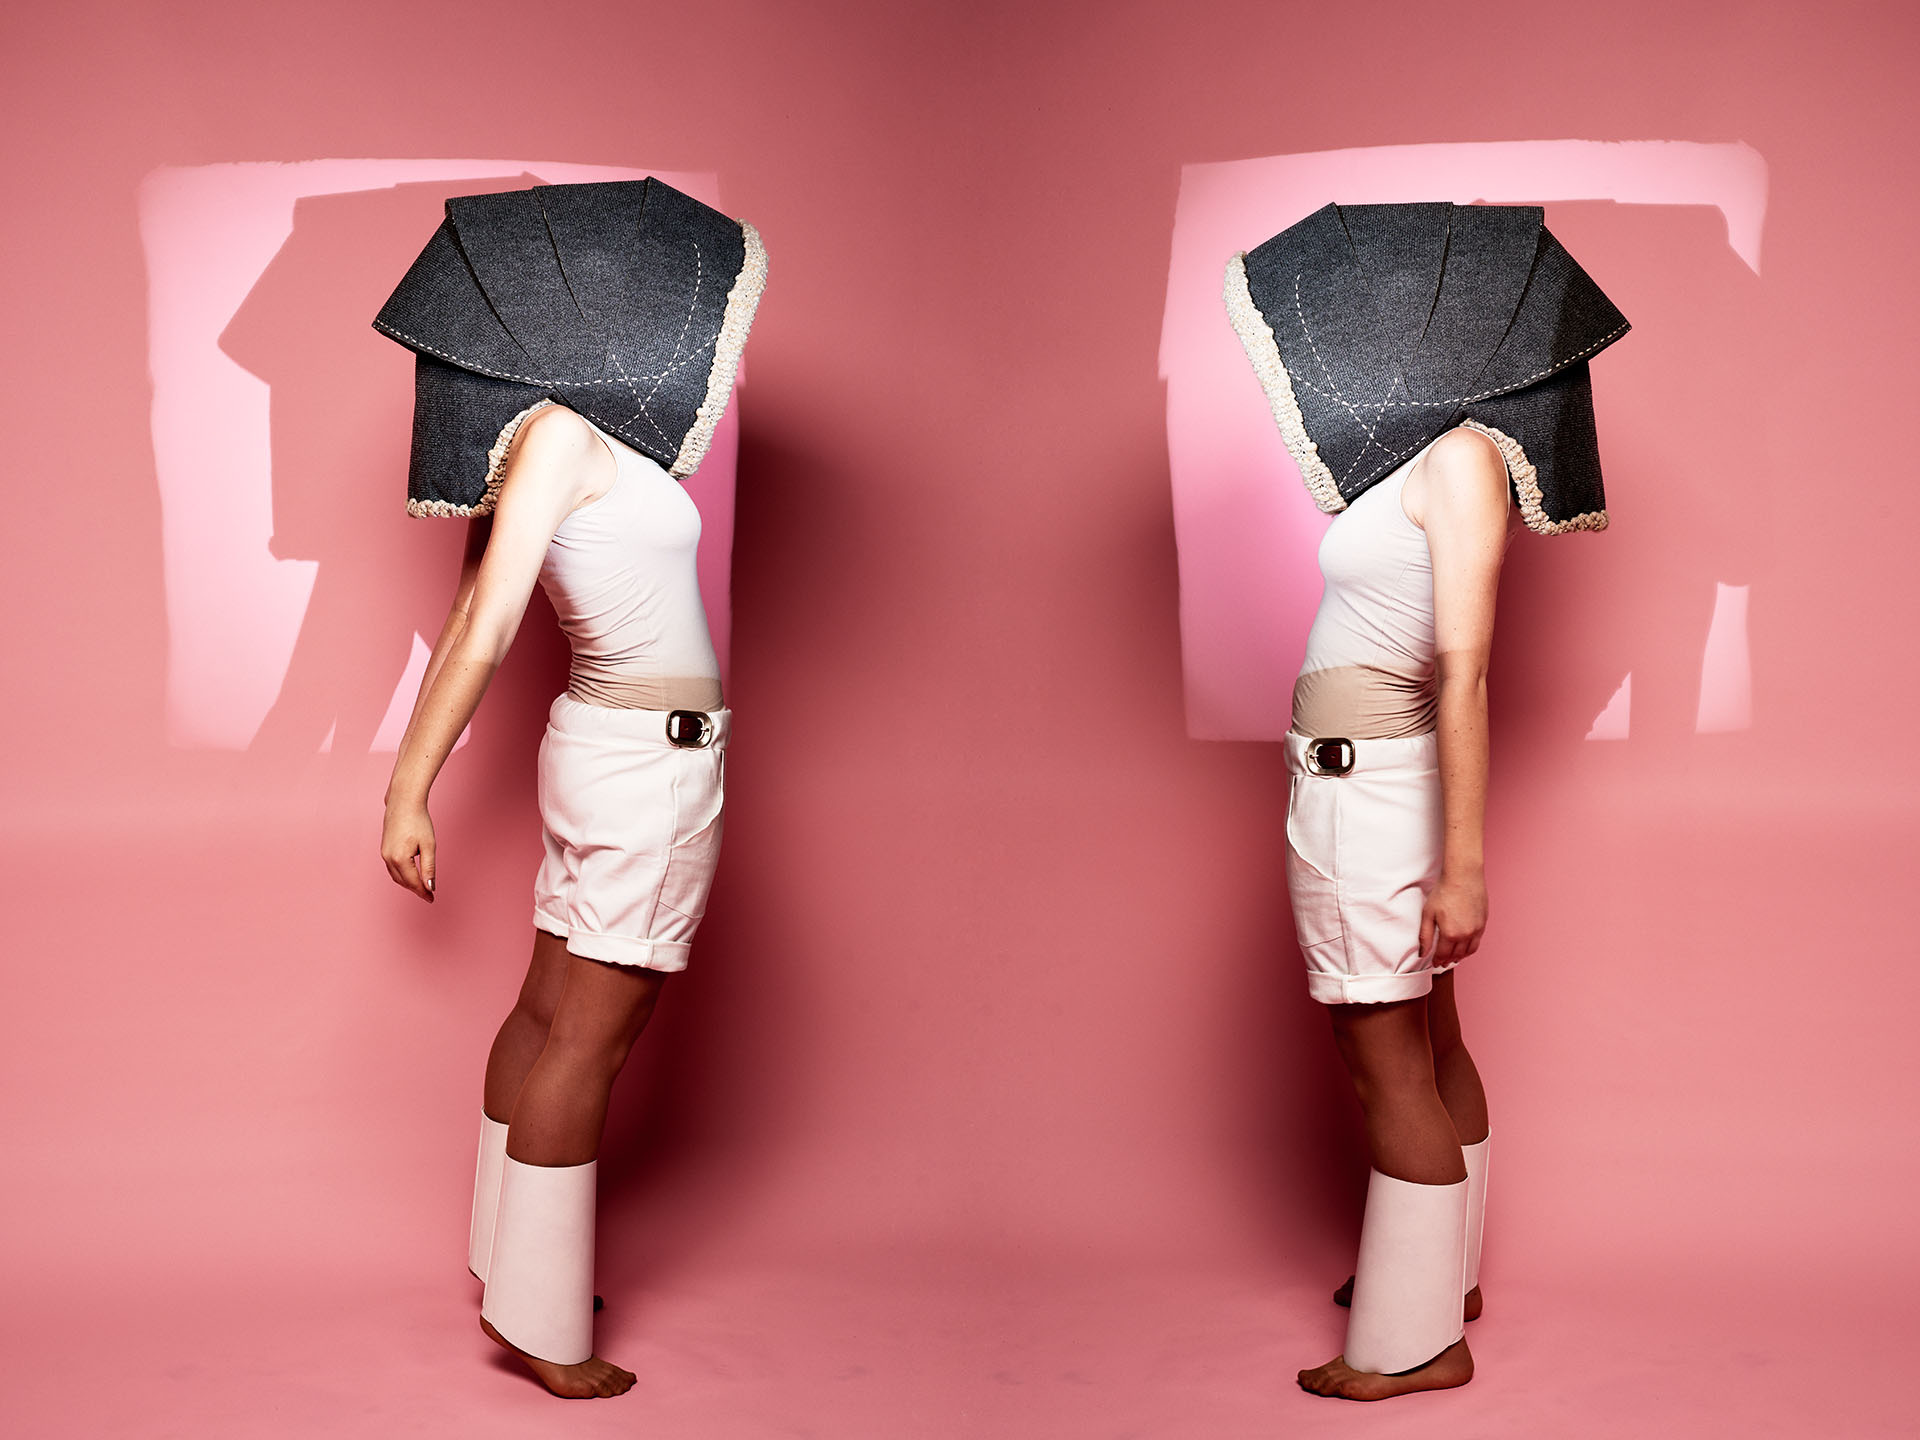 Flora Koel - Shooting création textile - 2014